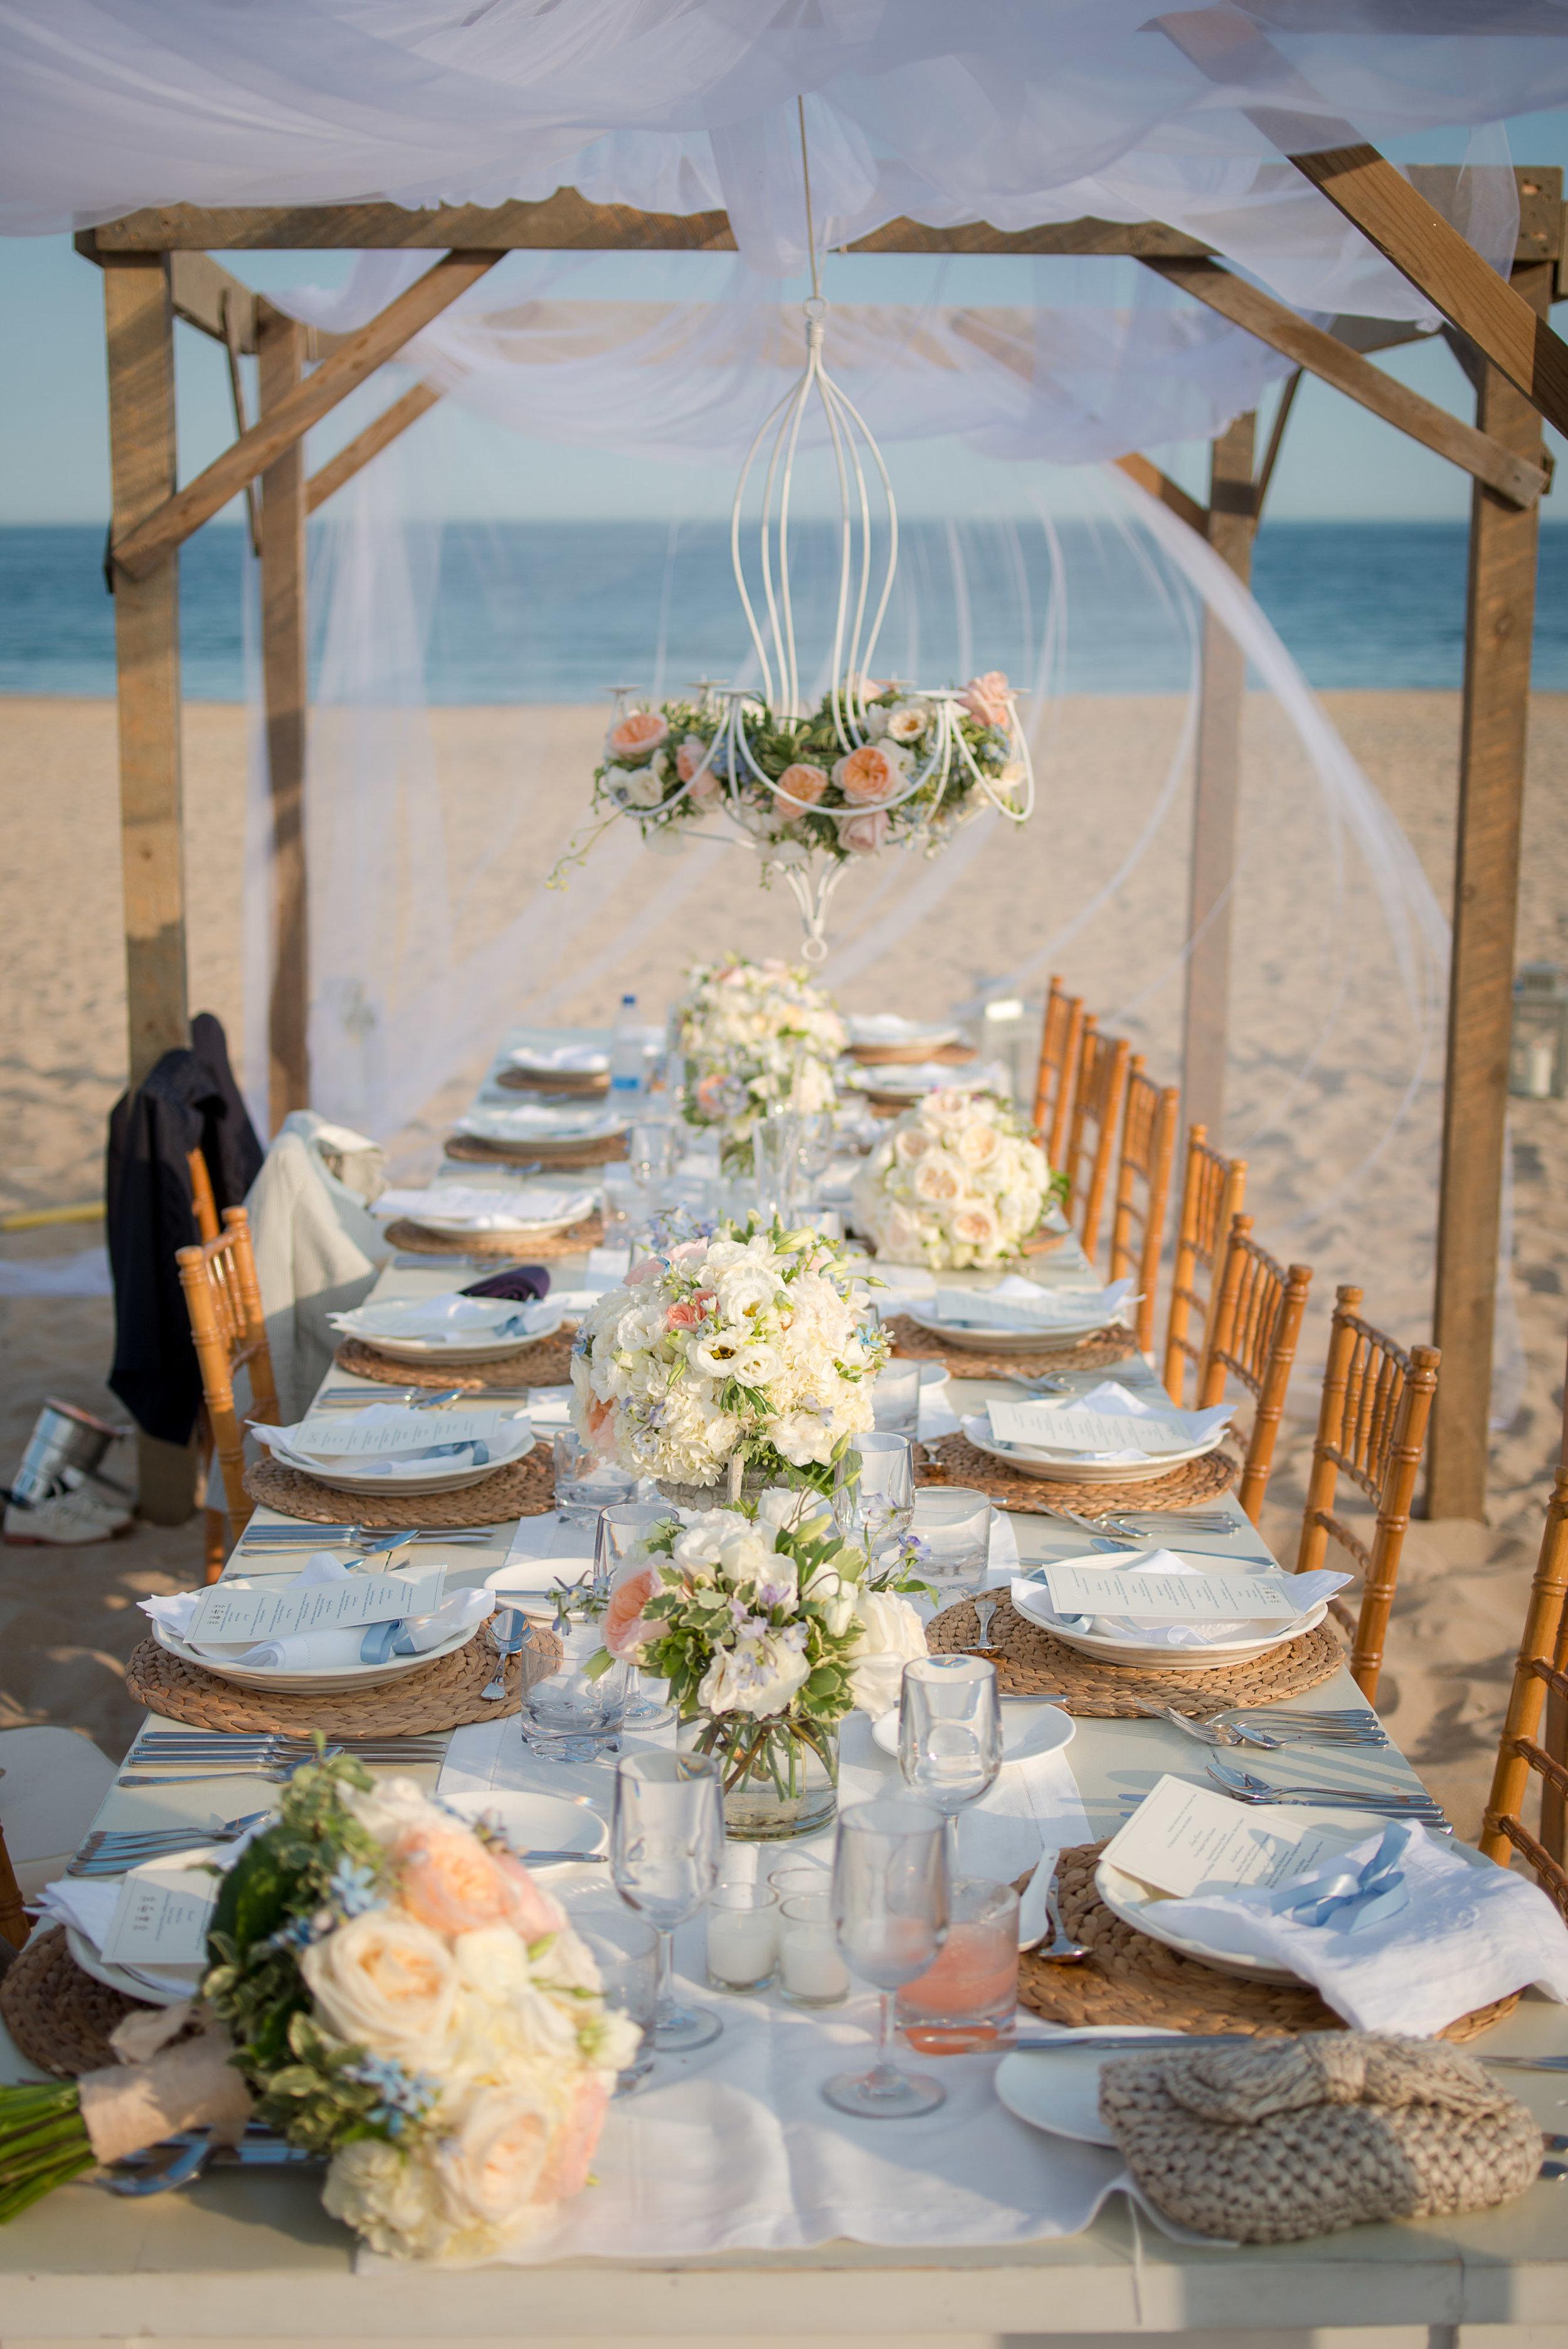 Hana Floral Design with Ashley Douglass Events, wedding planner at the Ocean House RI, Watch Hill, Rhode Island wedding